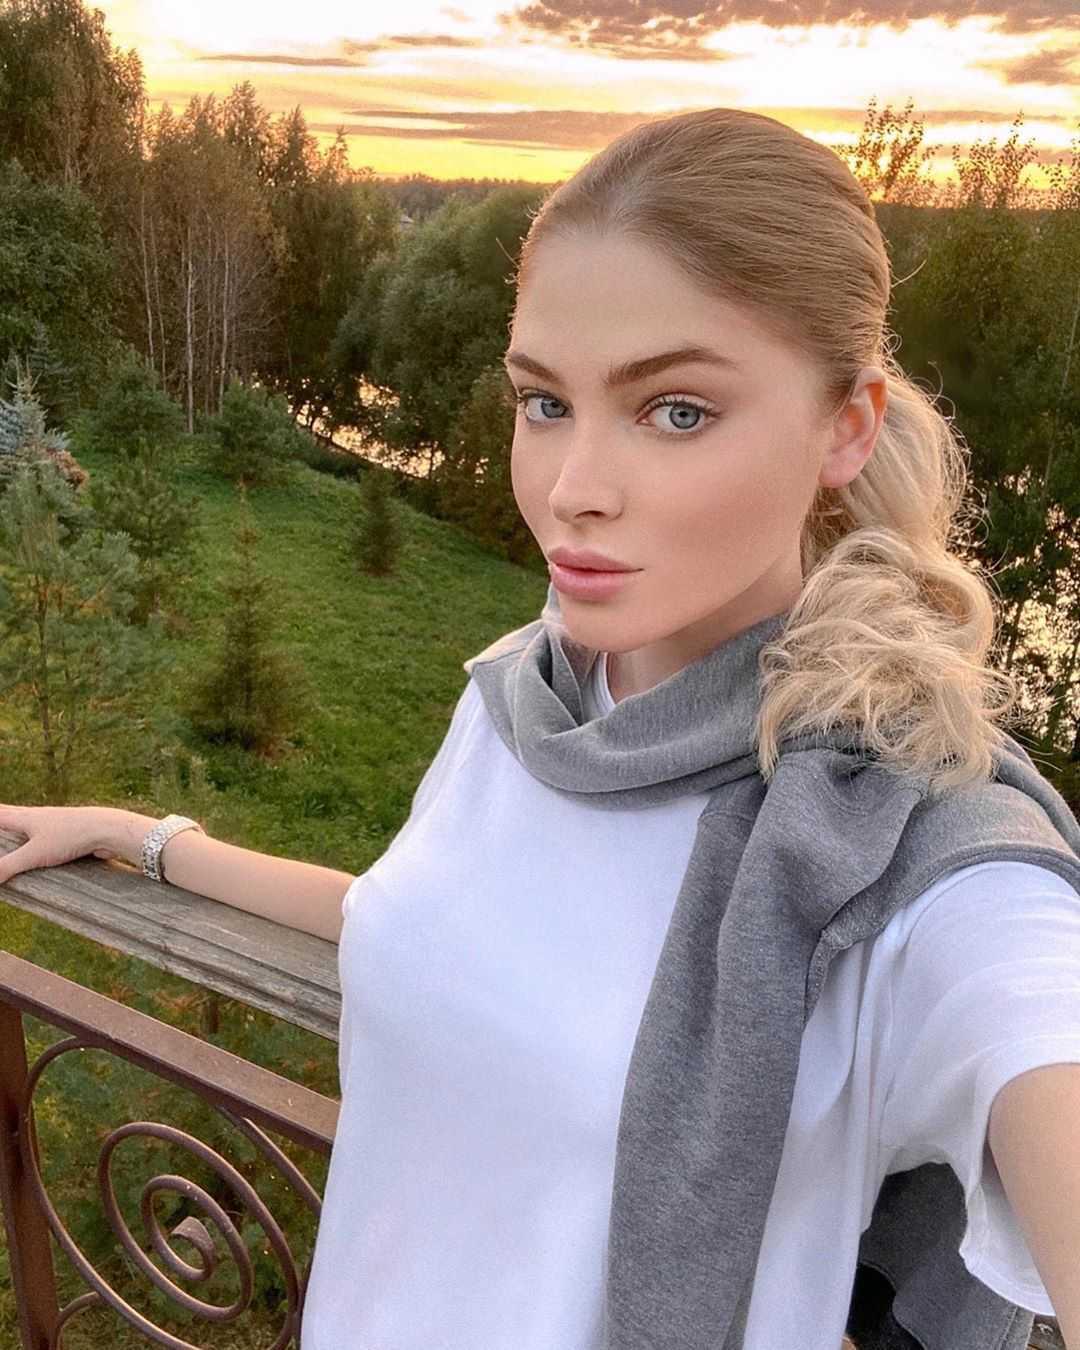 Алёна Шишкова отреагировала на разрыв Тимати с Анастасией Решетовой